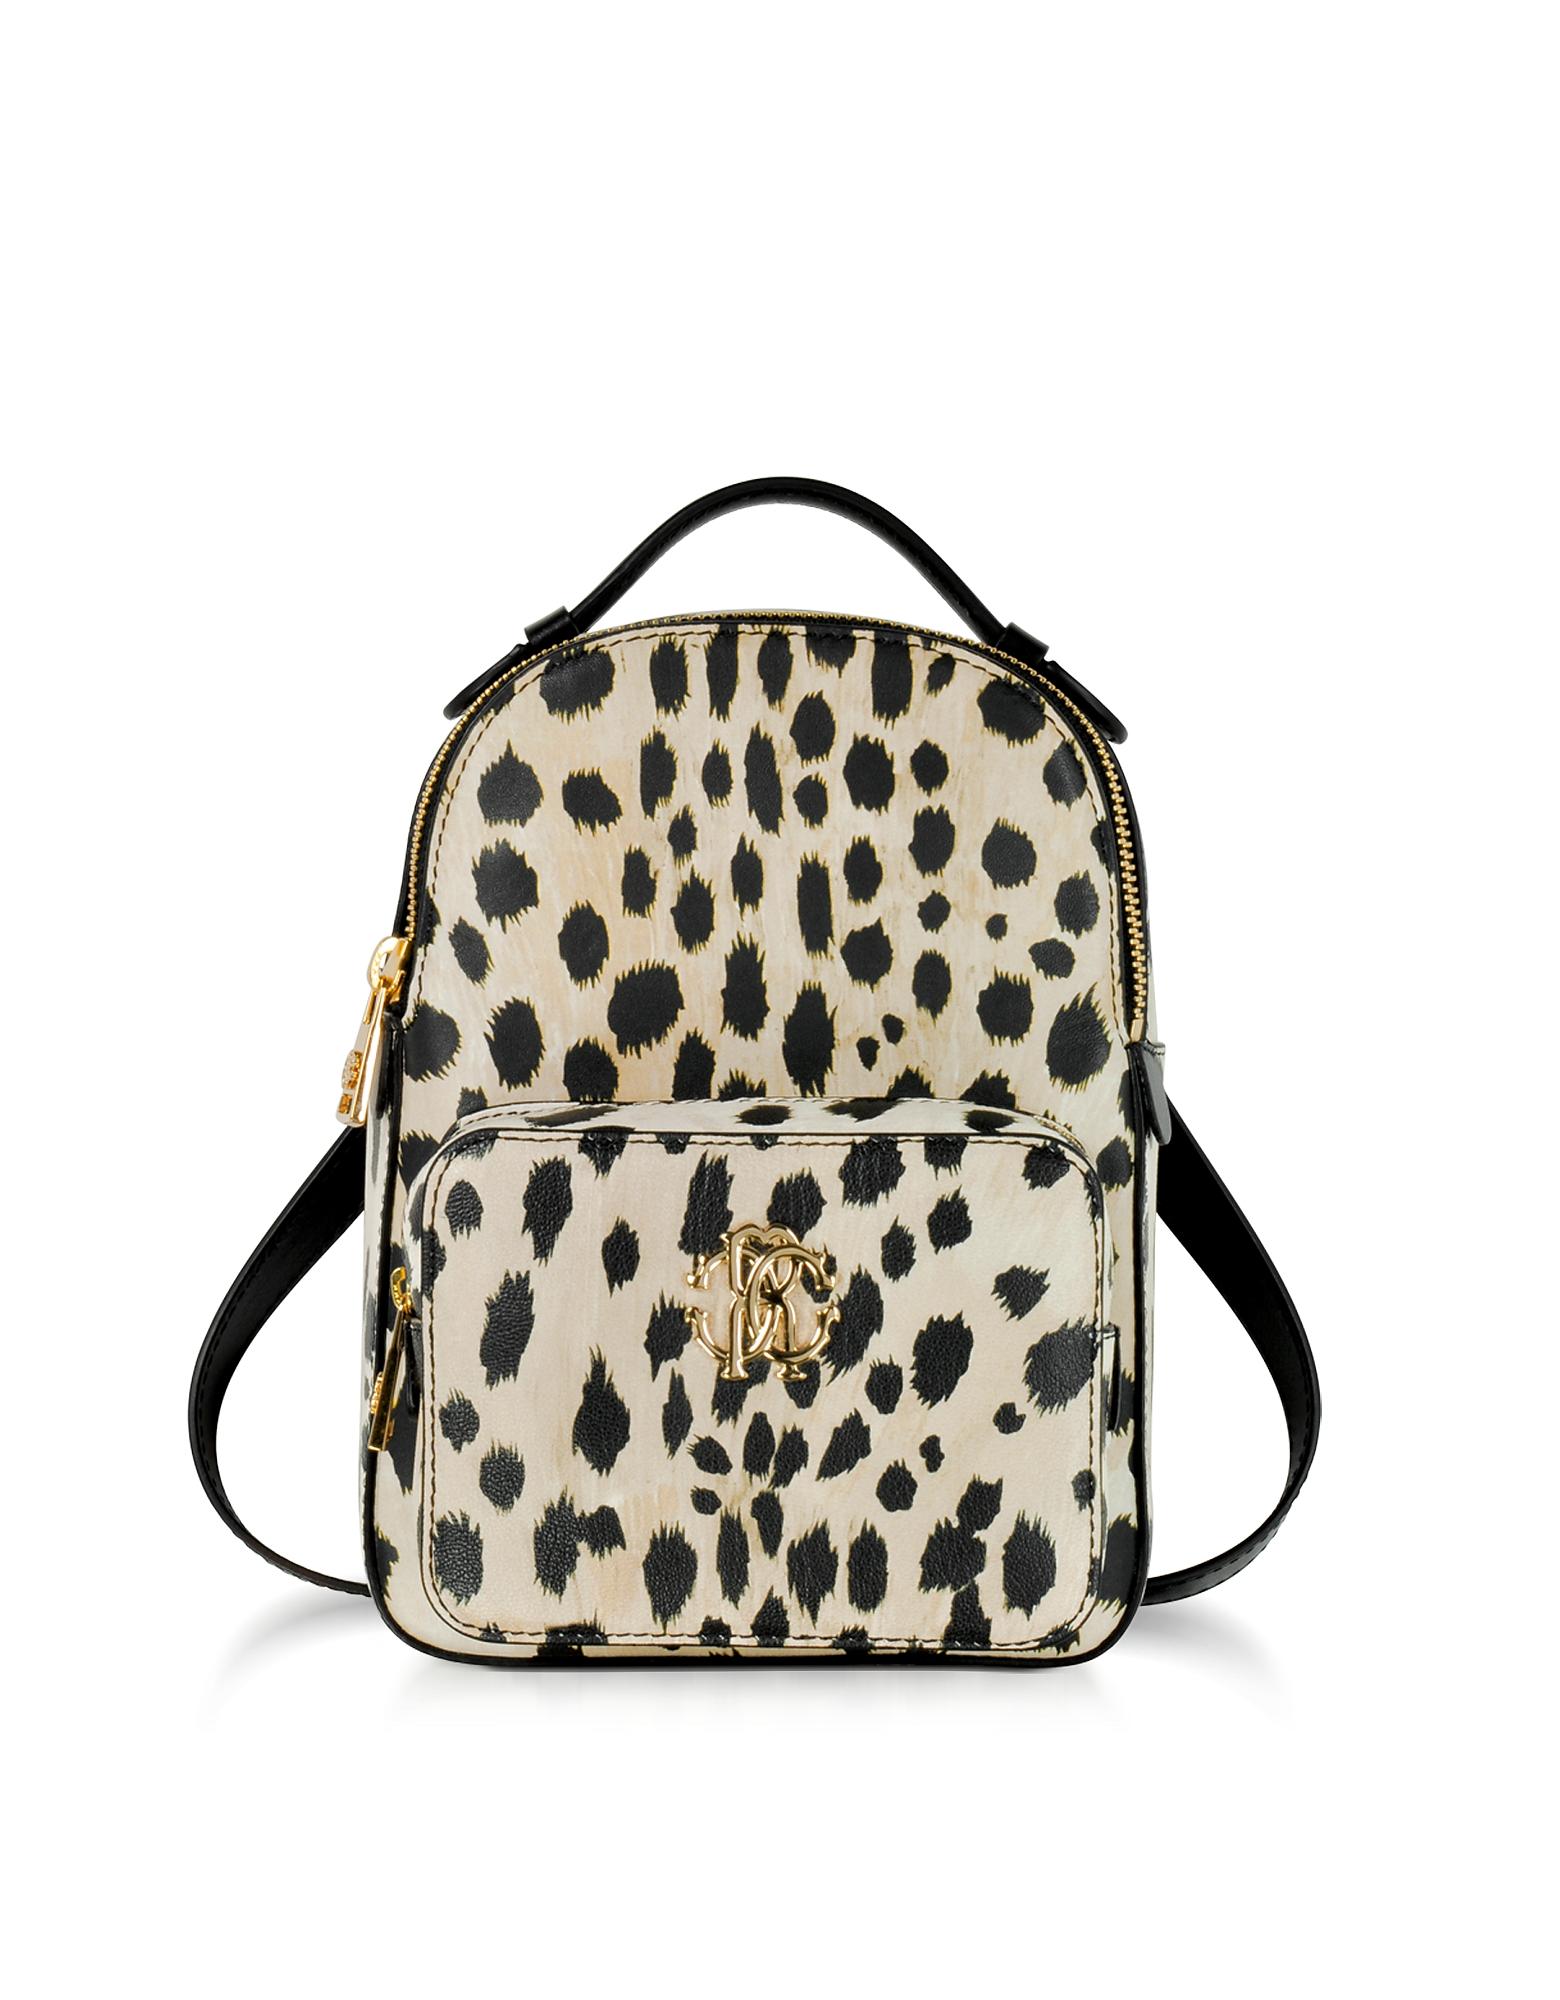 Roberto Cavalli Handbags, Animal Printed leather Small Backpack